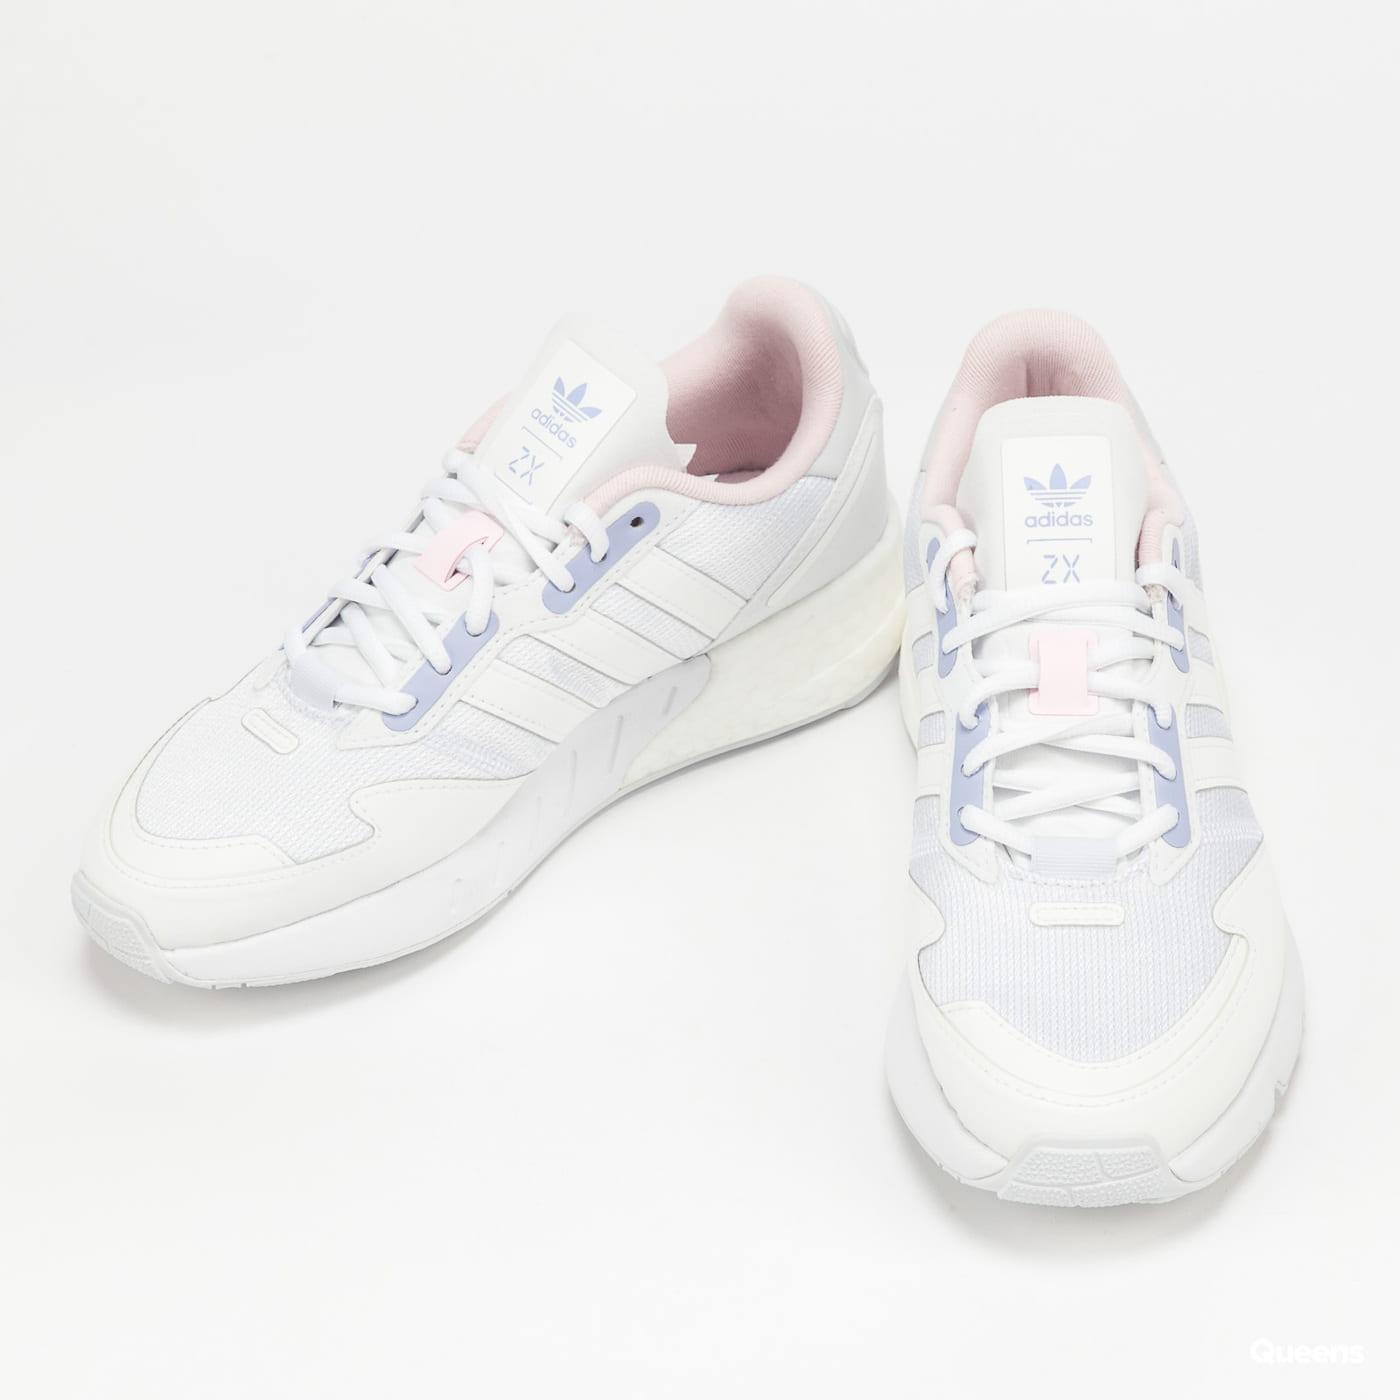 adidas Originals ZX 1K Boost W ftwwht / ftwwht / vioton